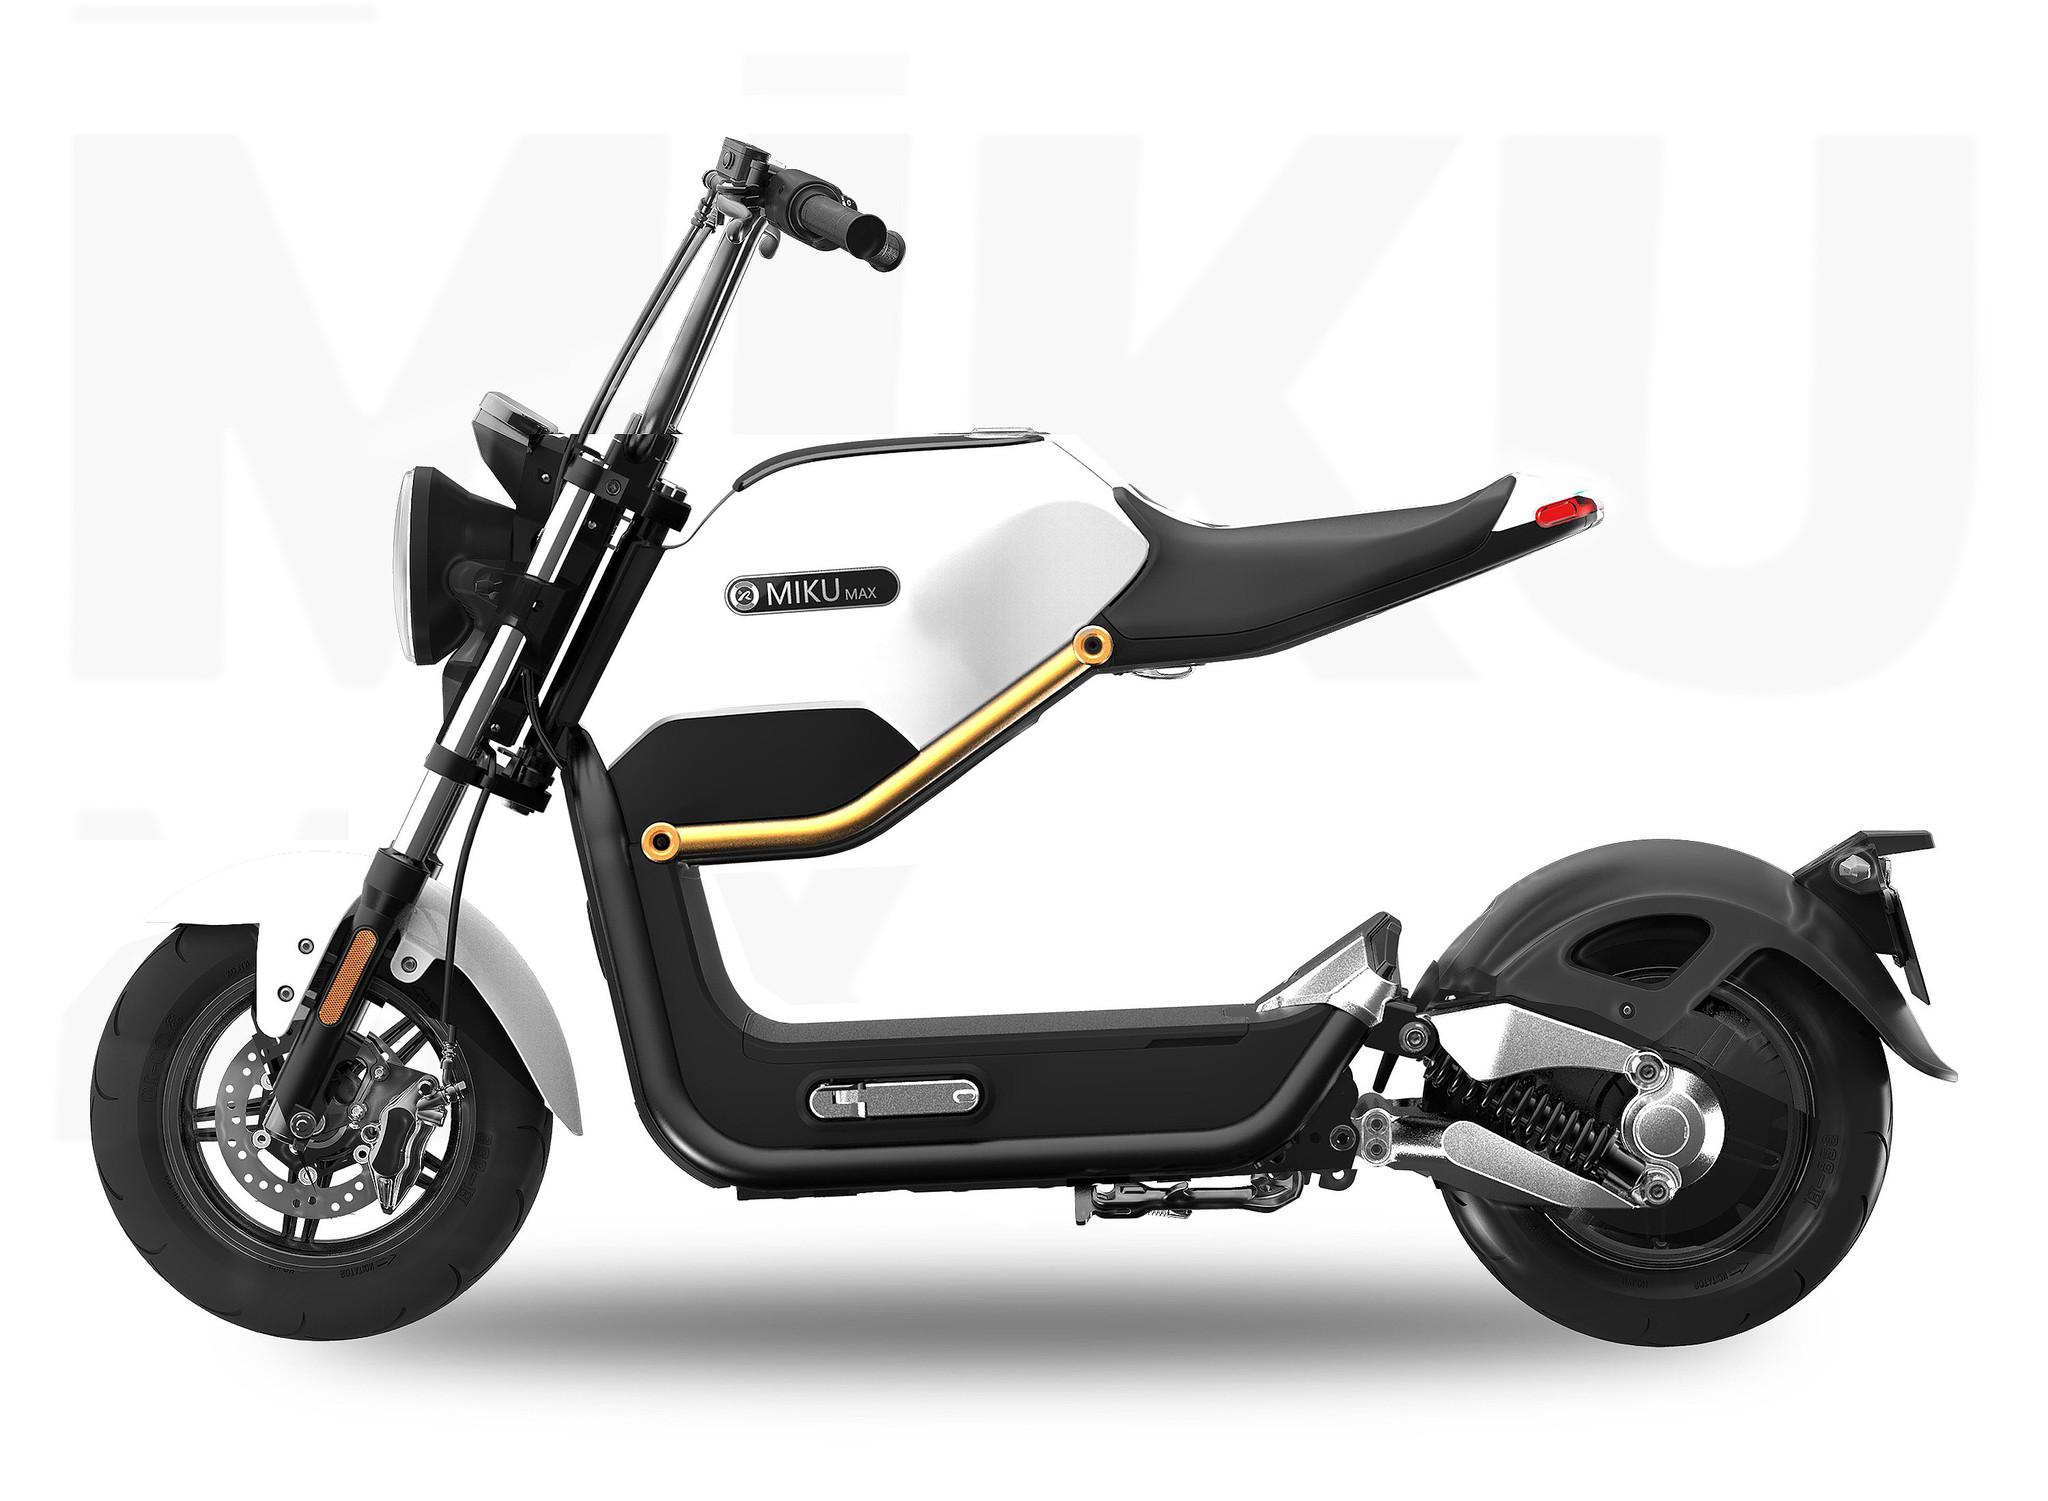 Elektro Scooter E Roller Mofa Miku Max mit Straßenzulassung